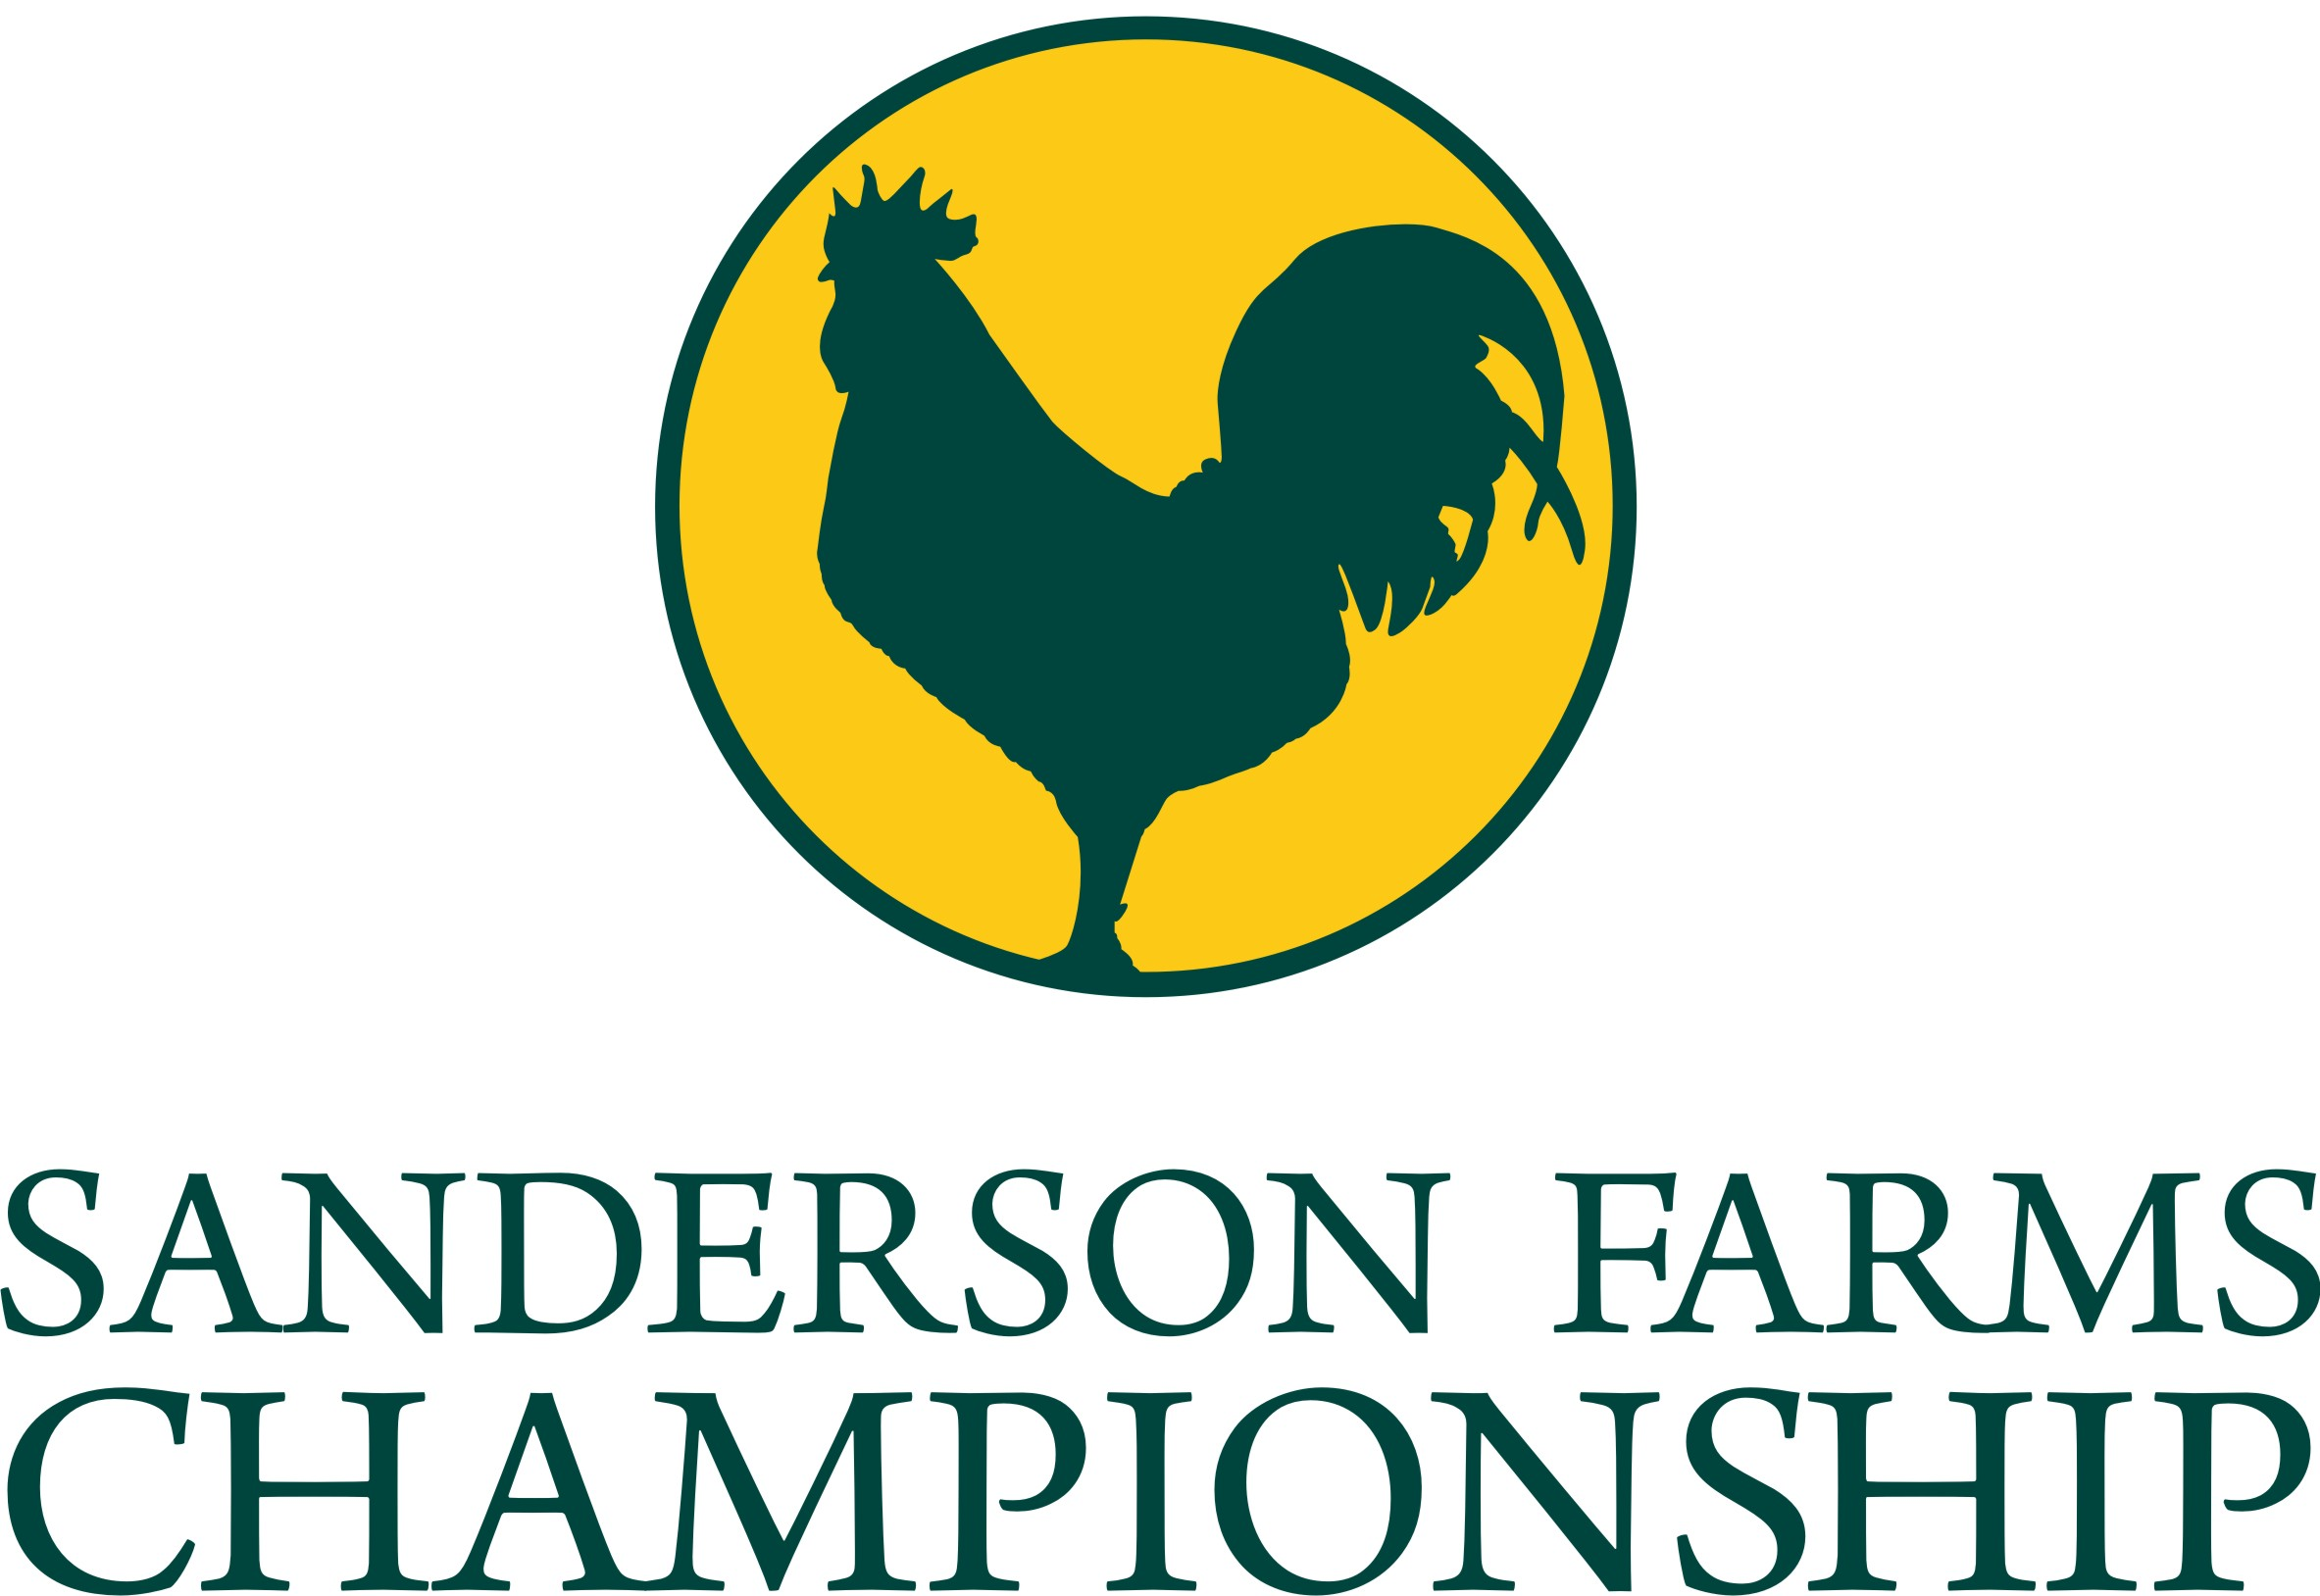 2019 Sanderson Farms Championship Announces Final Field